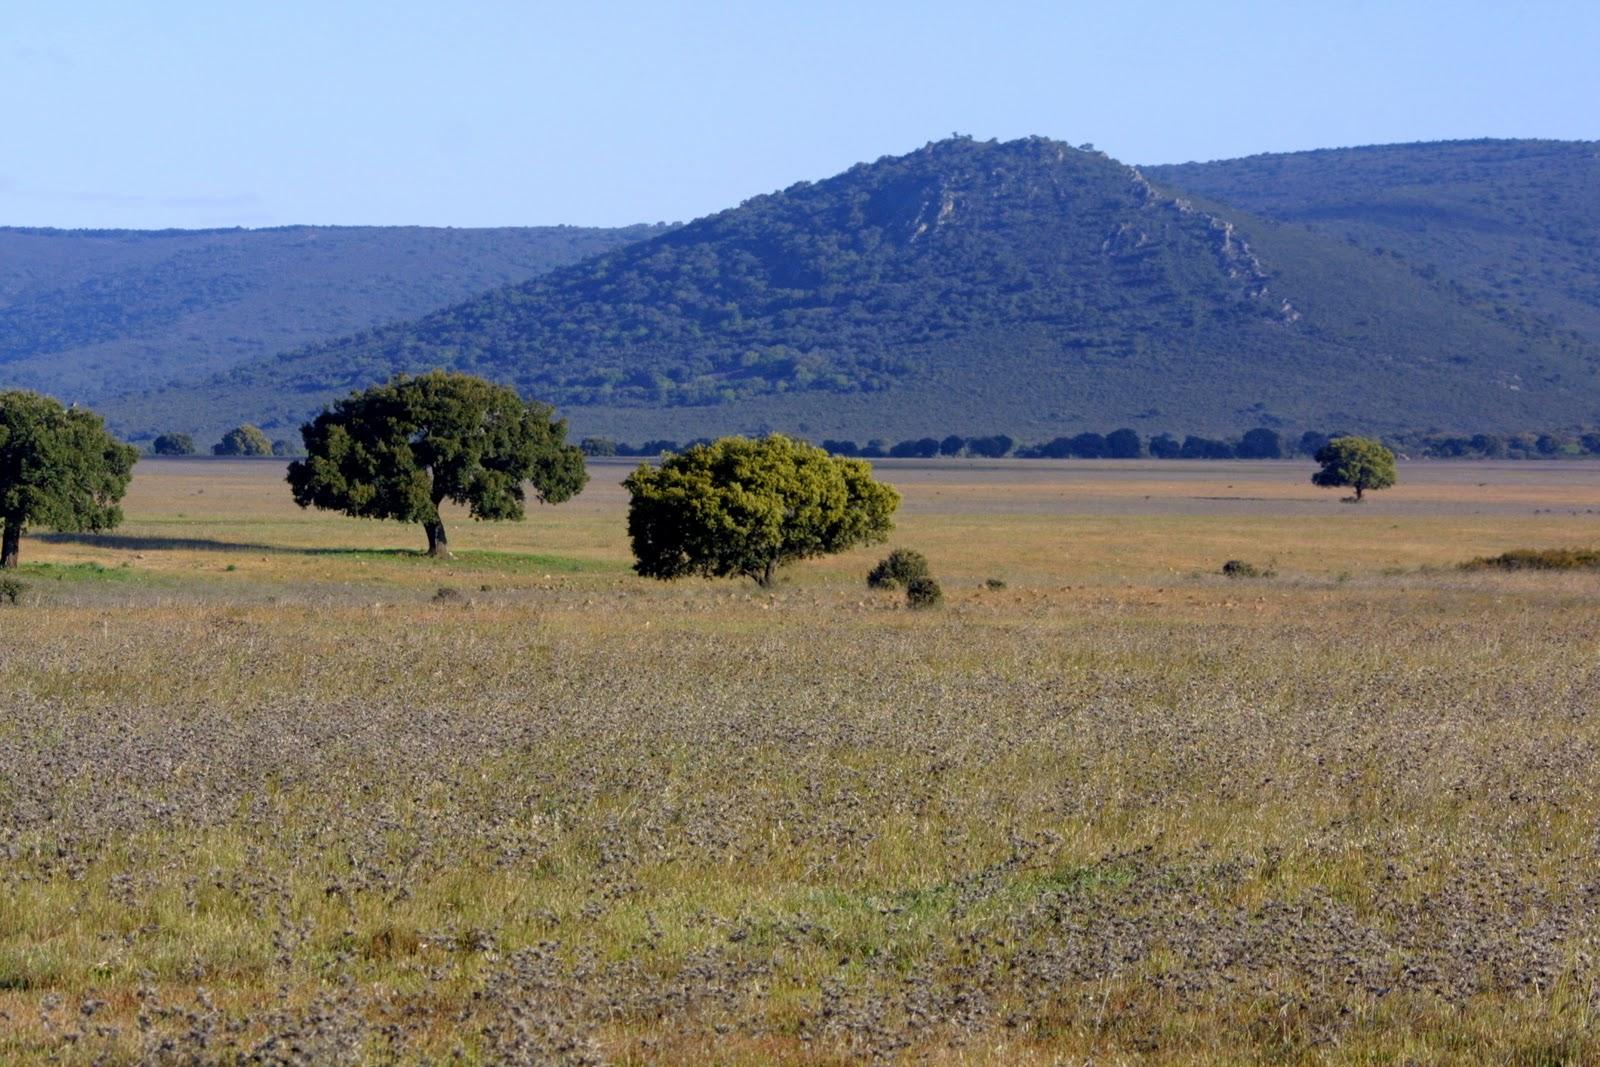 Geograf a de espa a los grandes conjuntos naturales espa oles for Clima mediterraneo de interior